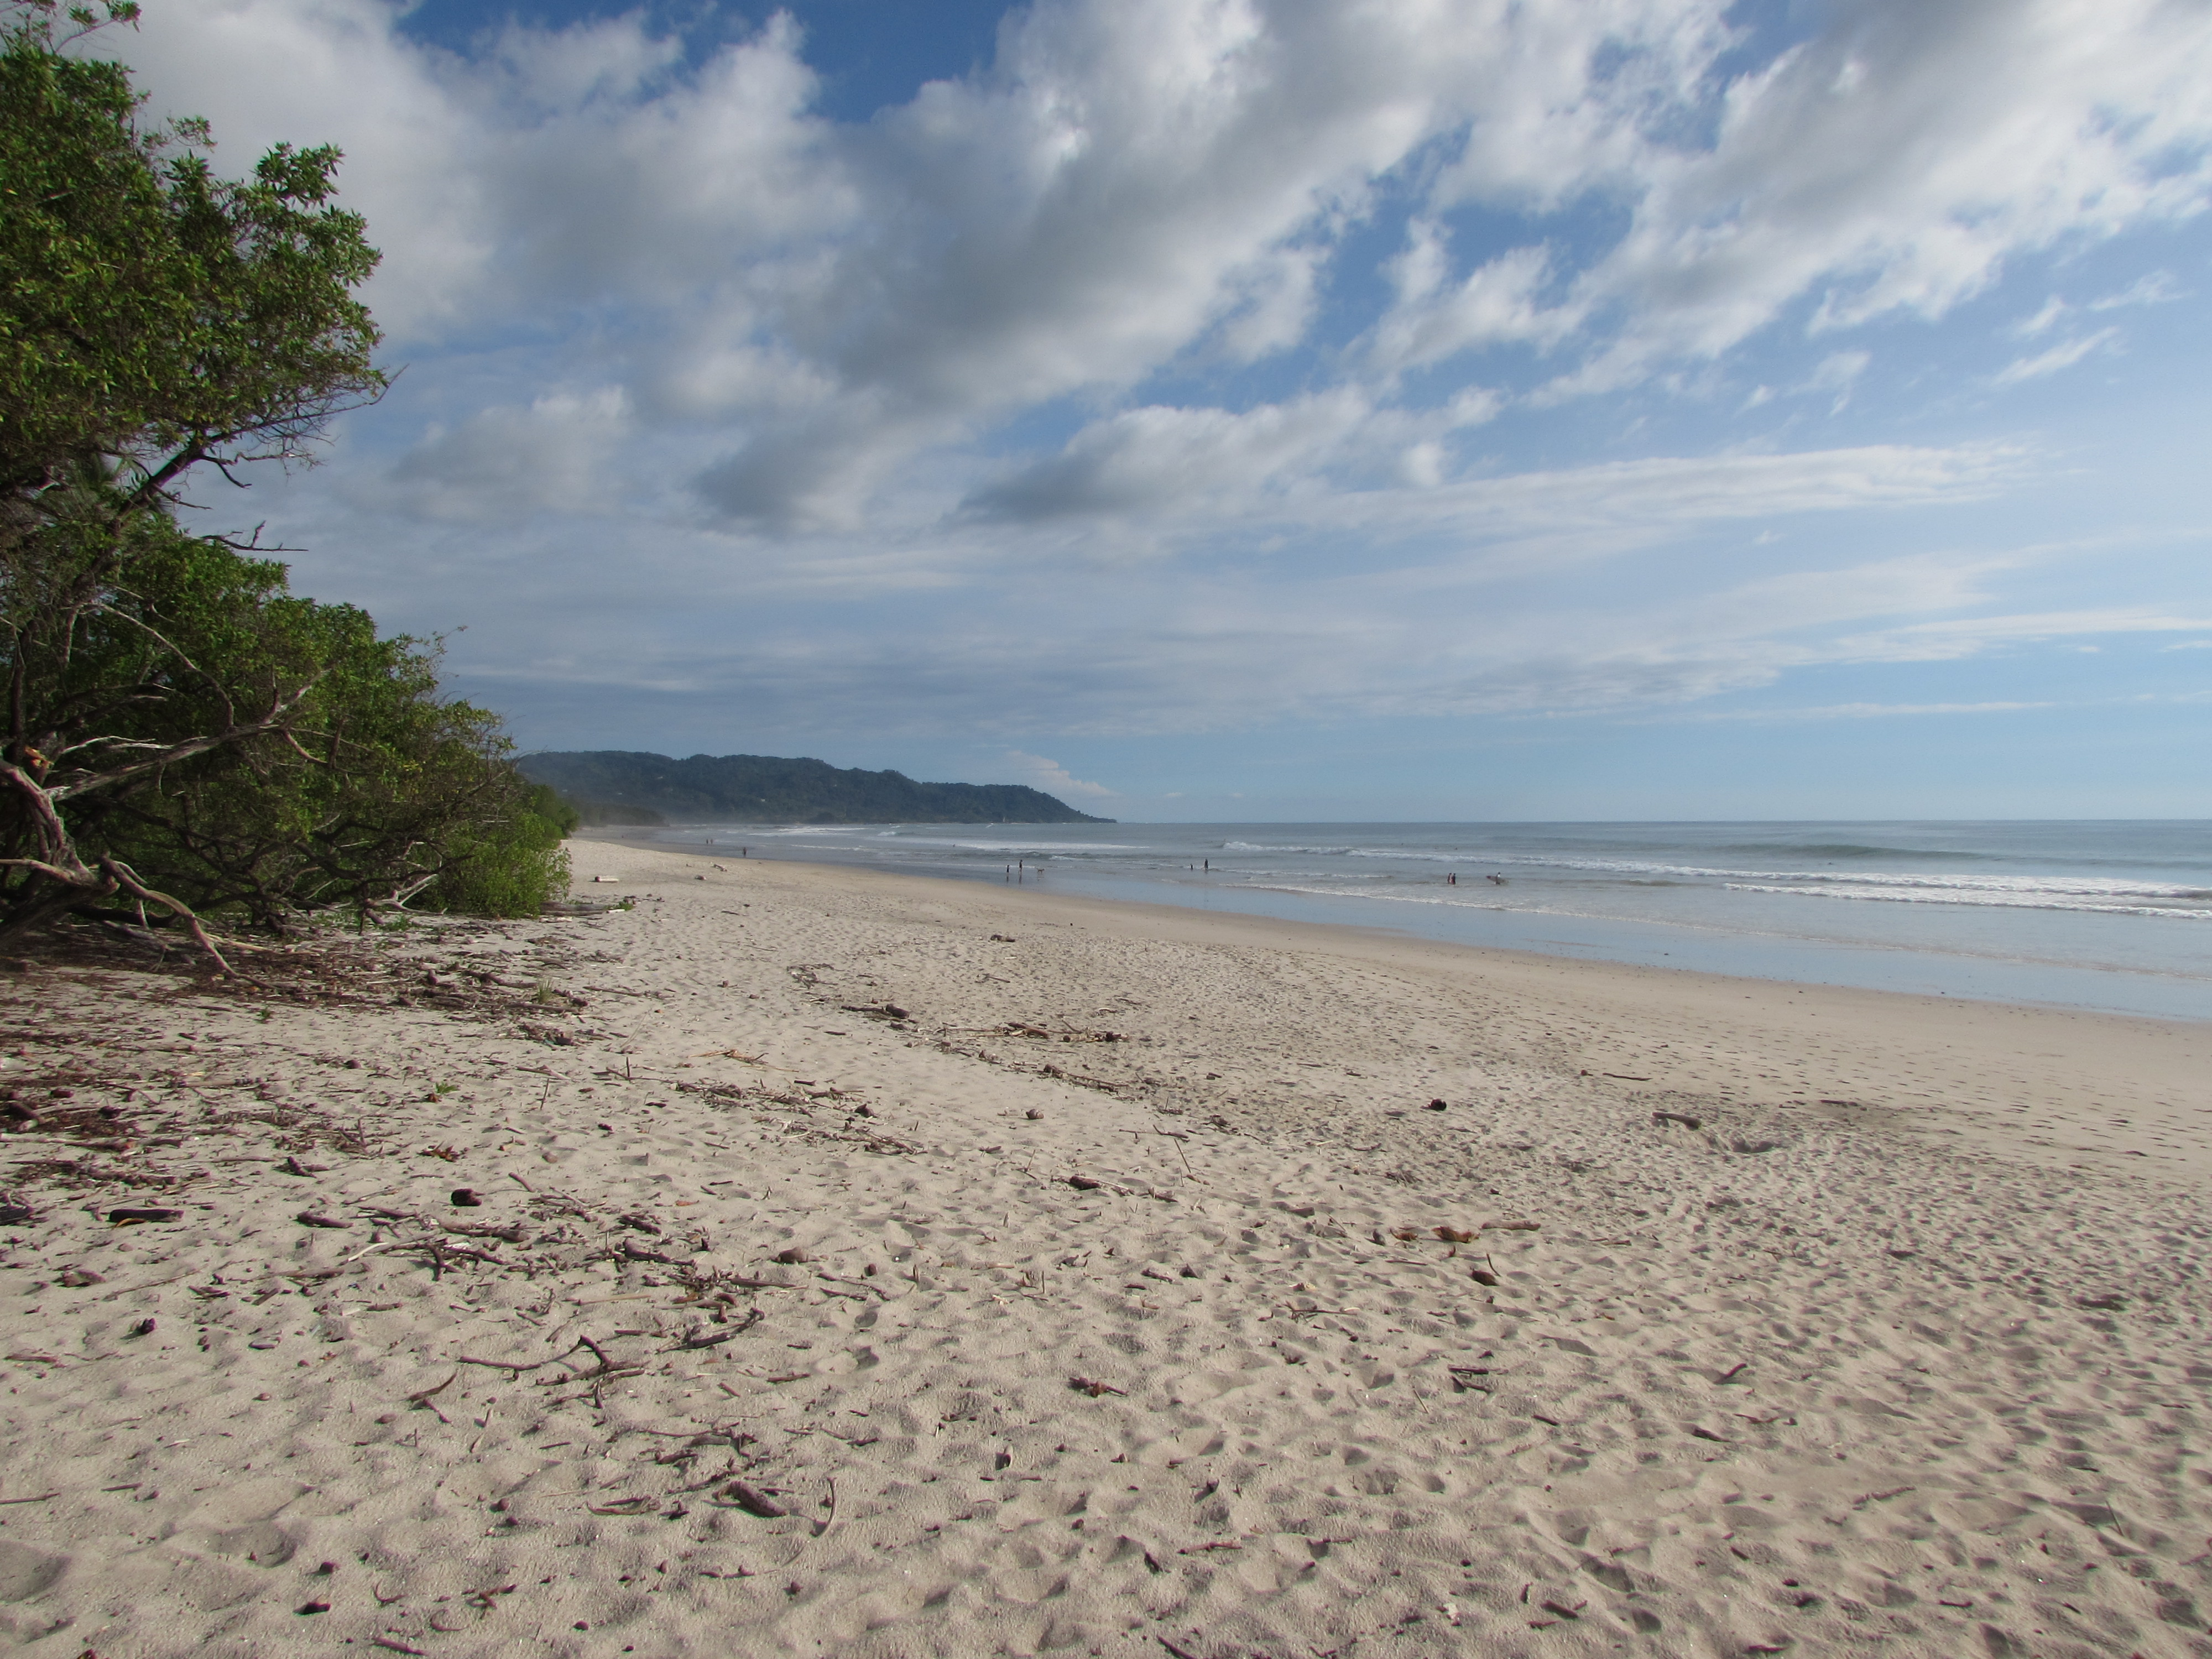 Santa Teresa Sky and Beach